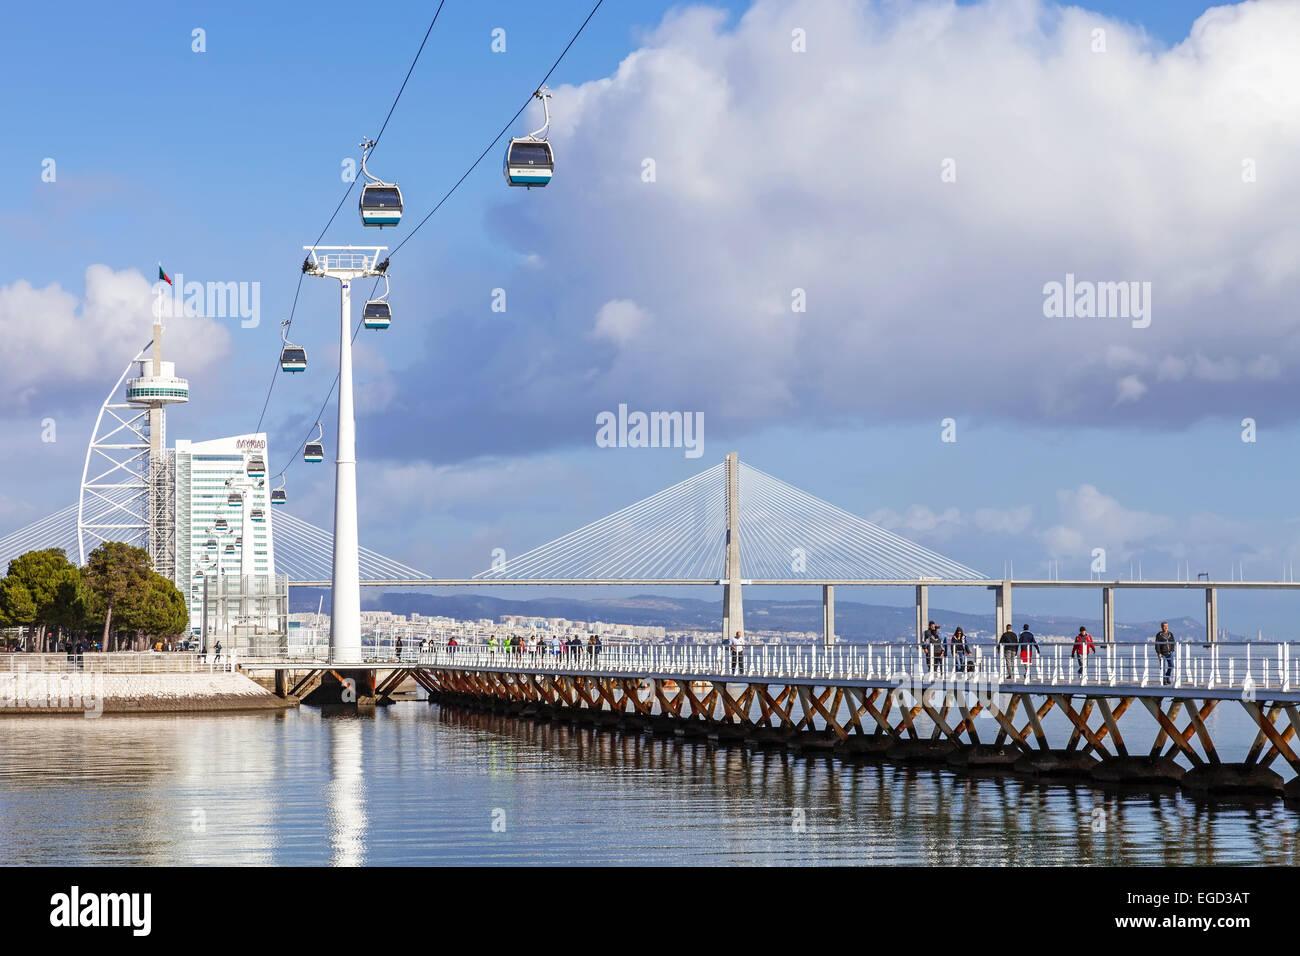 People practicing sports on the Passeio Ribeirinho over the Tagus River. Vasco da Gama Tower and Bridge, Myriad - Stock Image